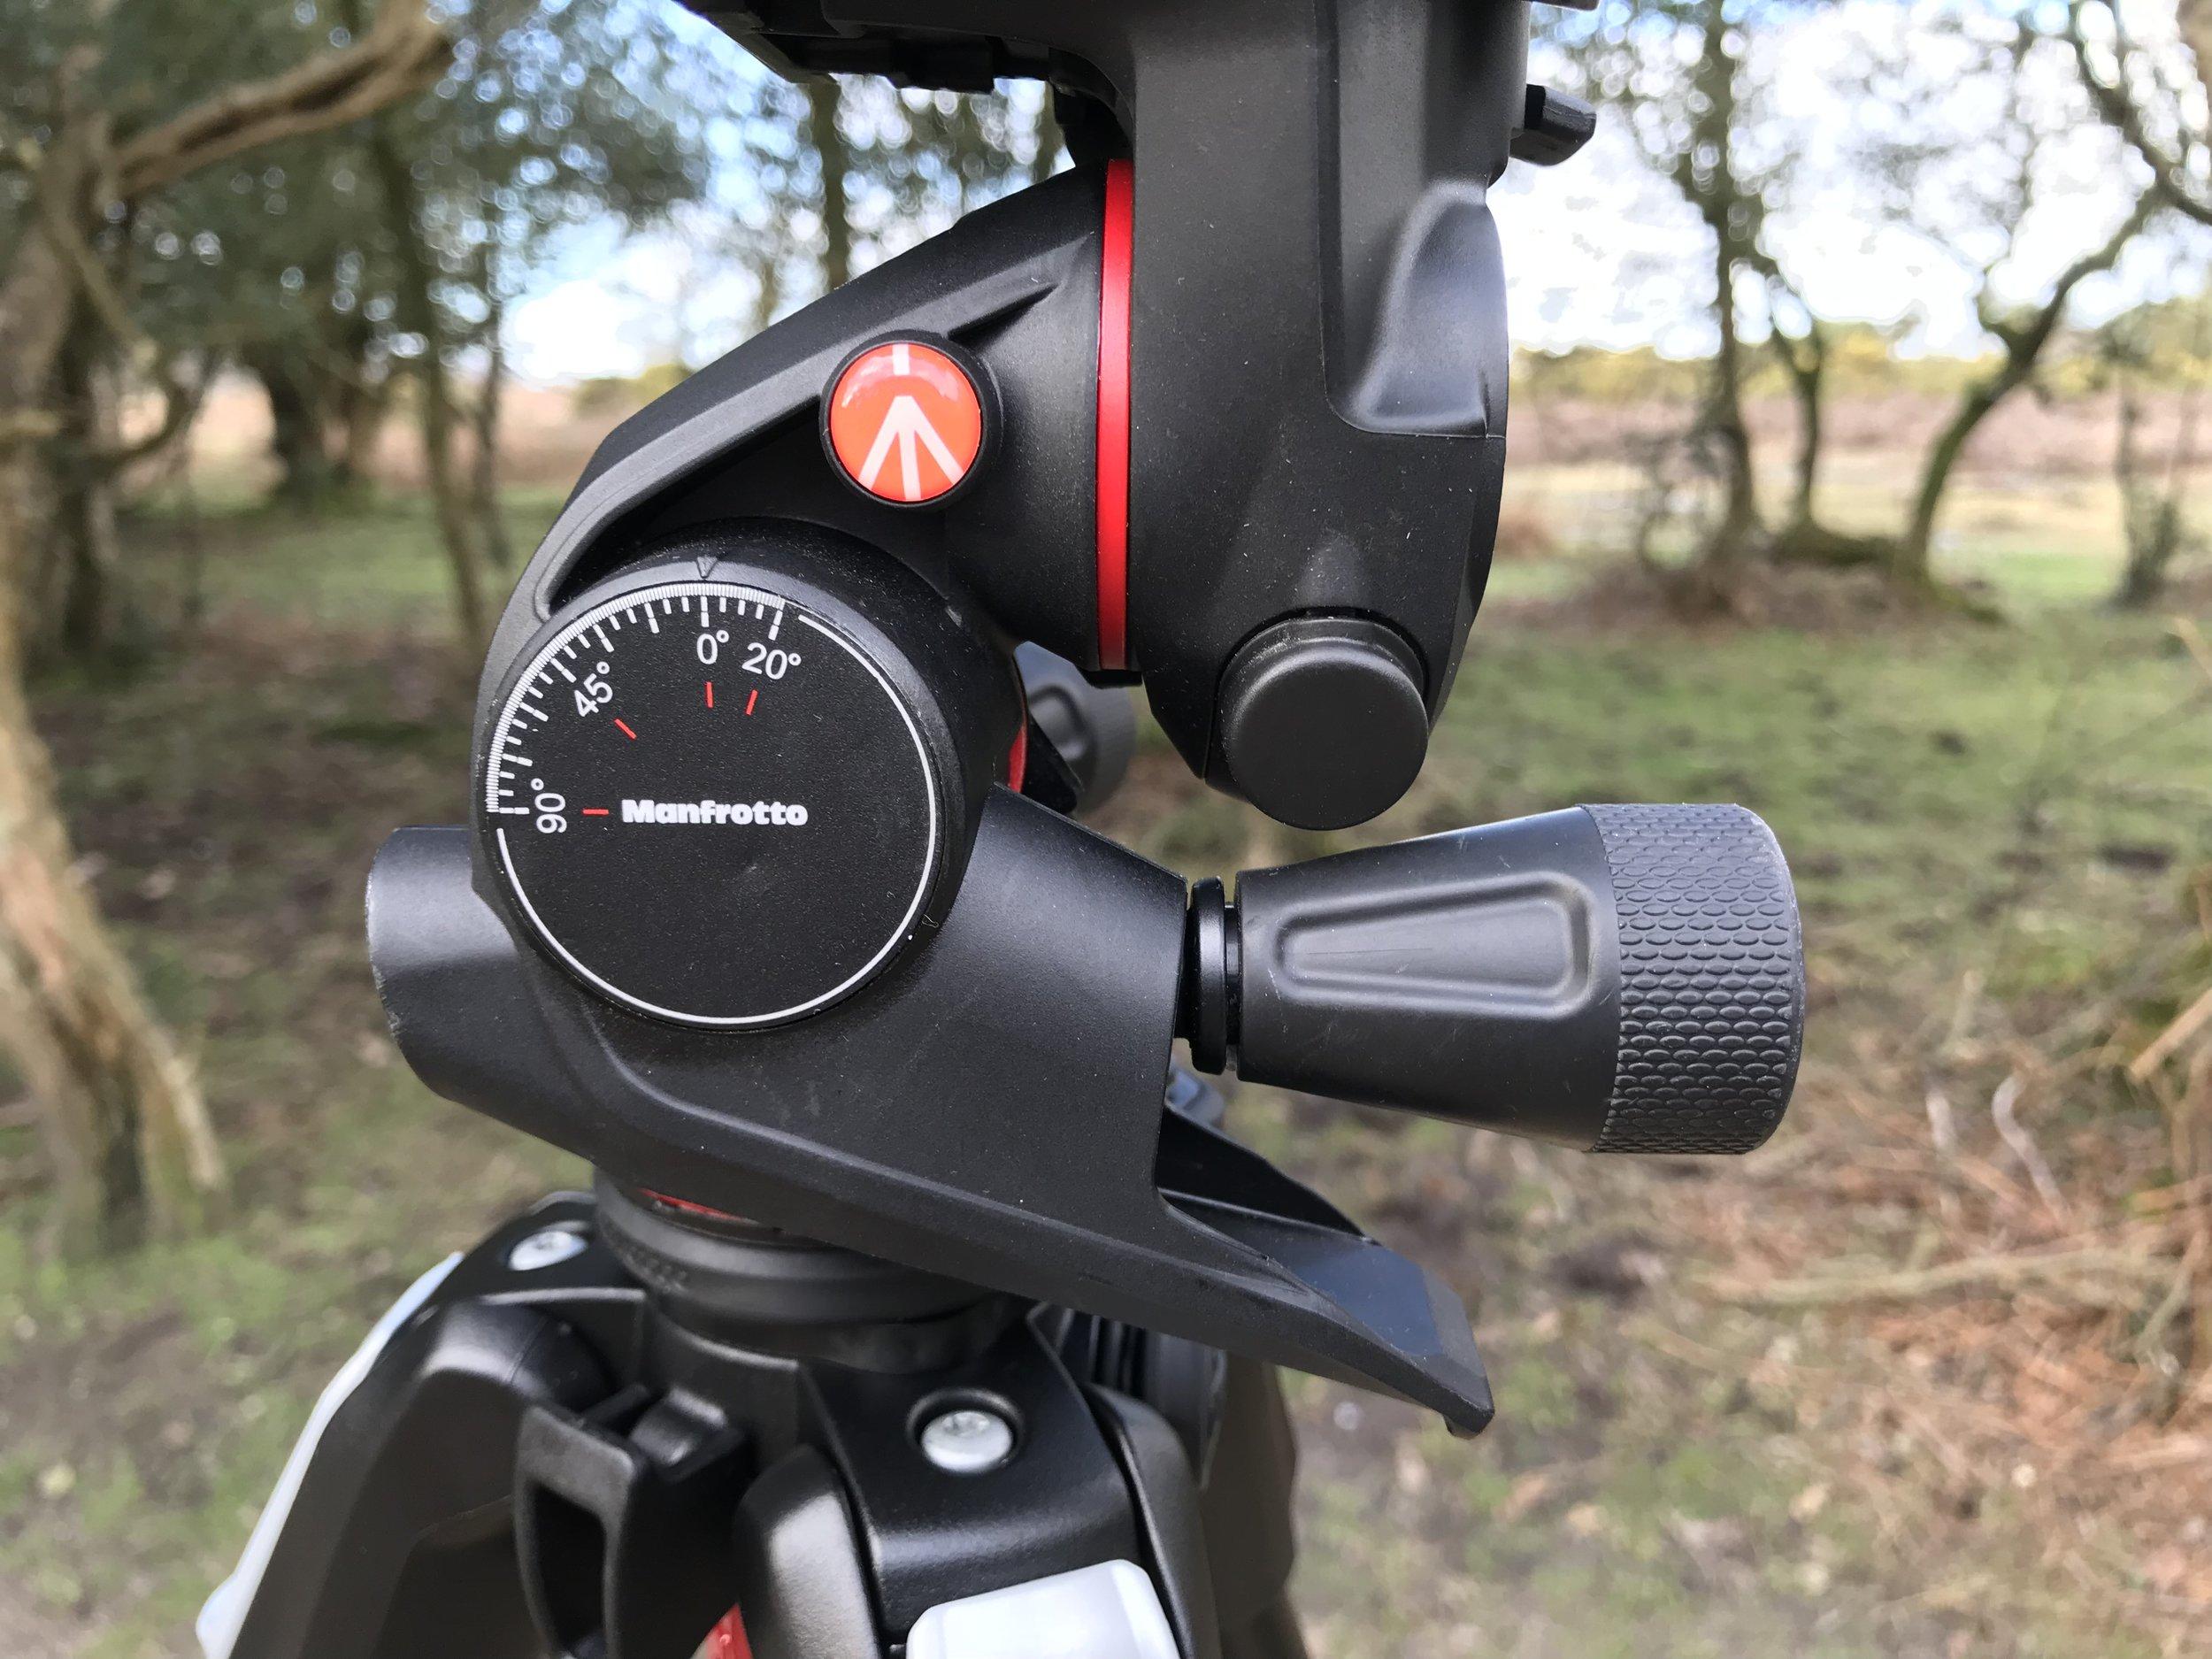 ManfrottoXPRO Geared Three-way pan/tilt tripod head